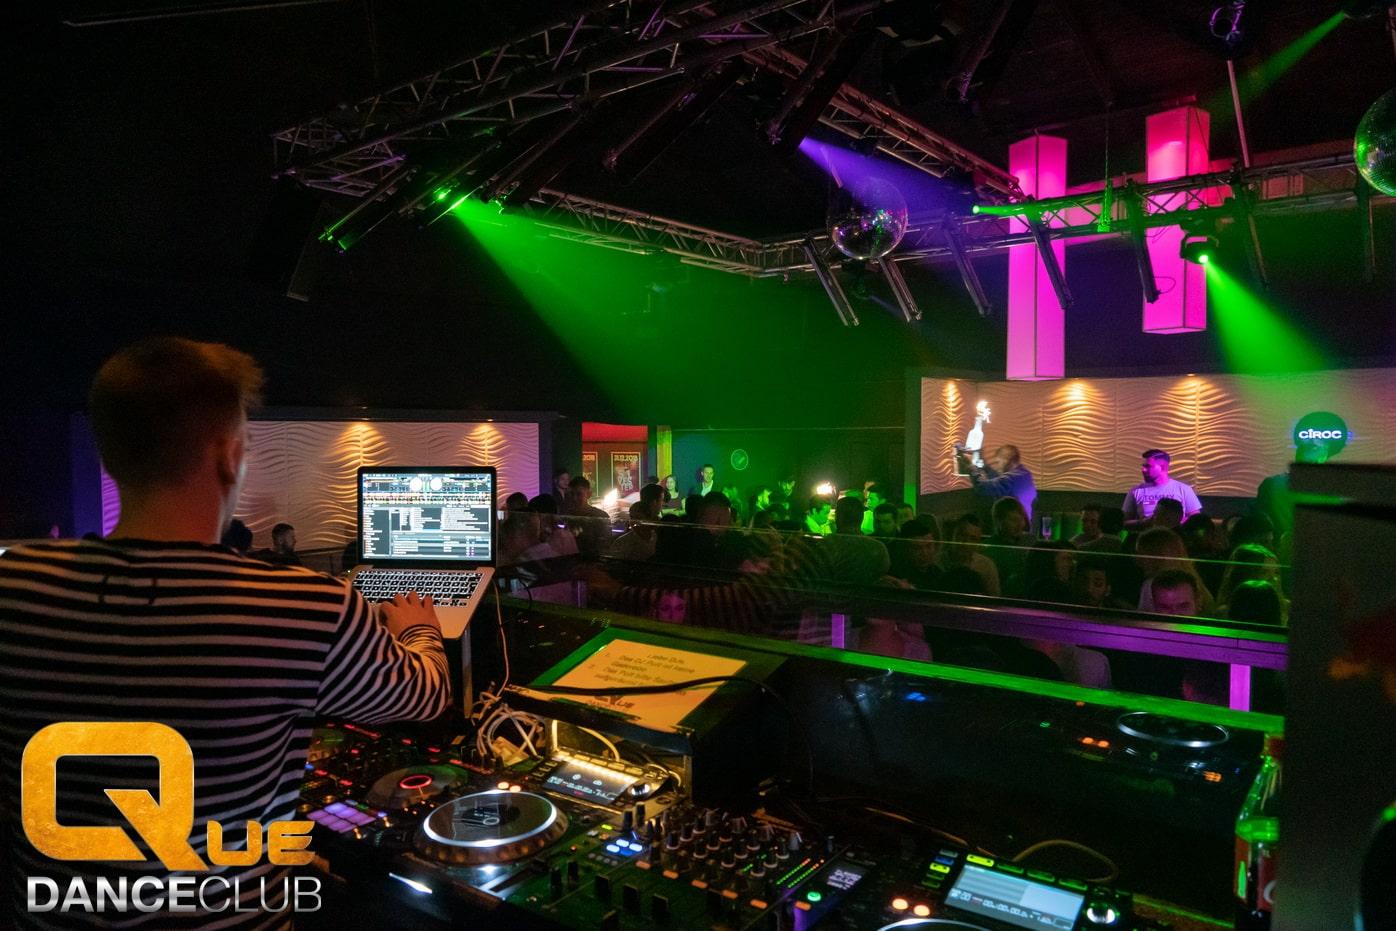 2018_12_08_Que_Danceclub_Paparazzo_Night_Ardian_Bujupi_Live_Nightlife_Scene_Timo_019